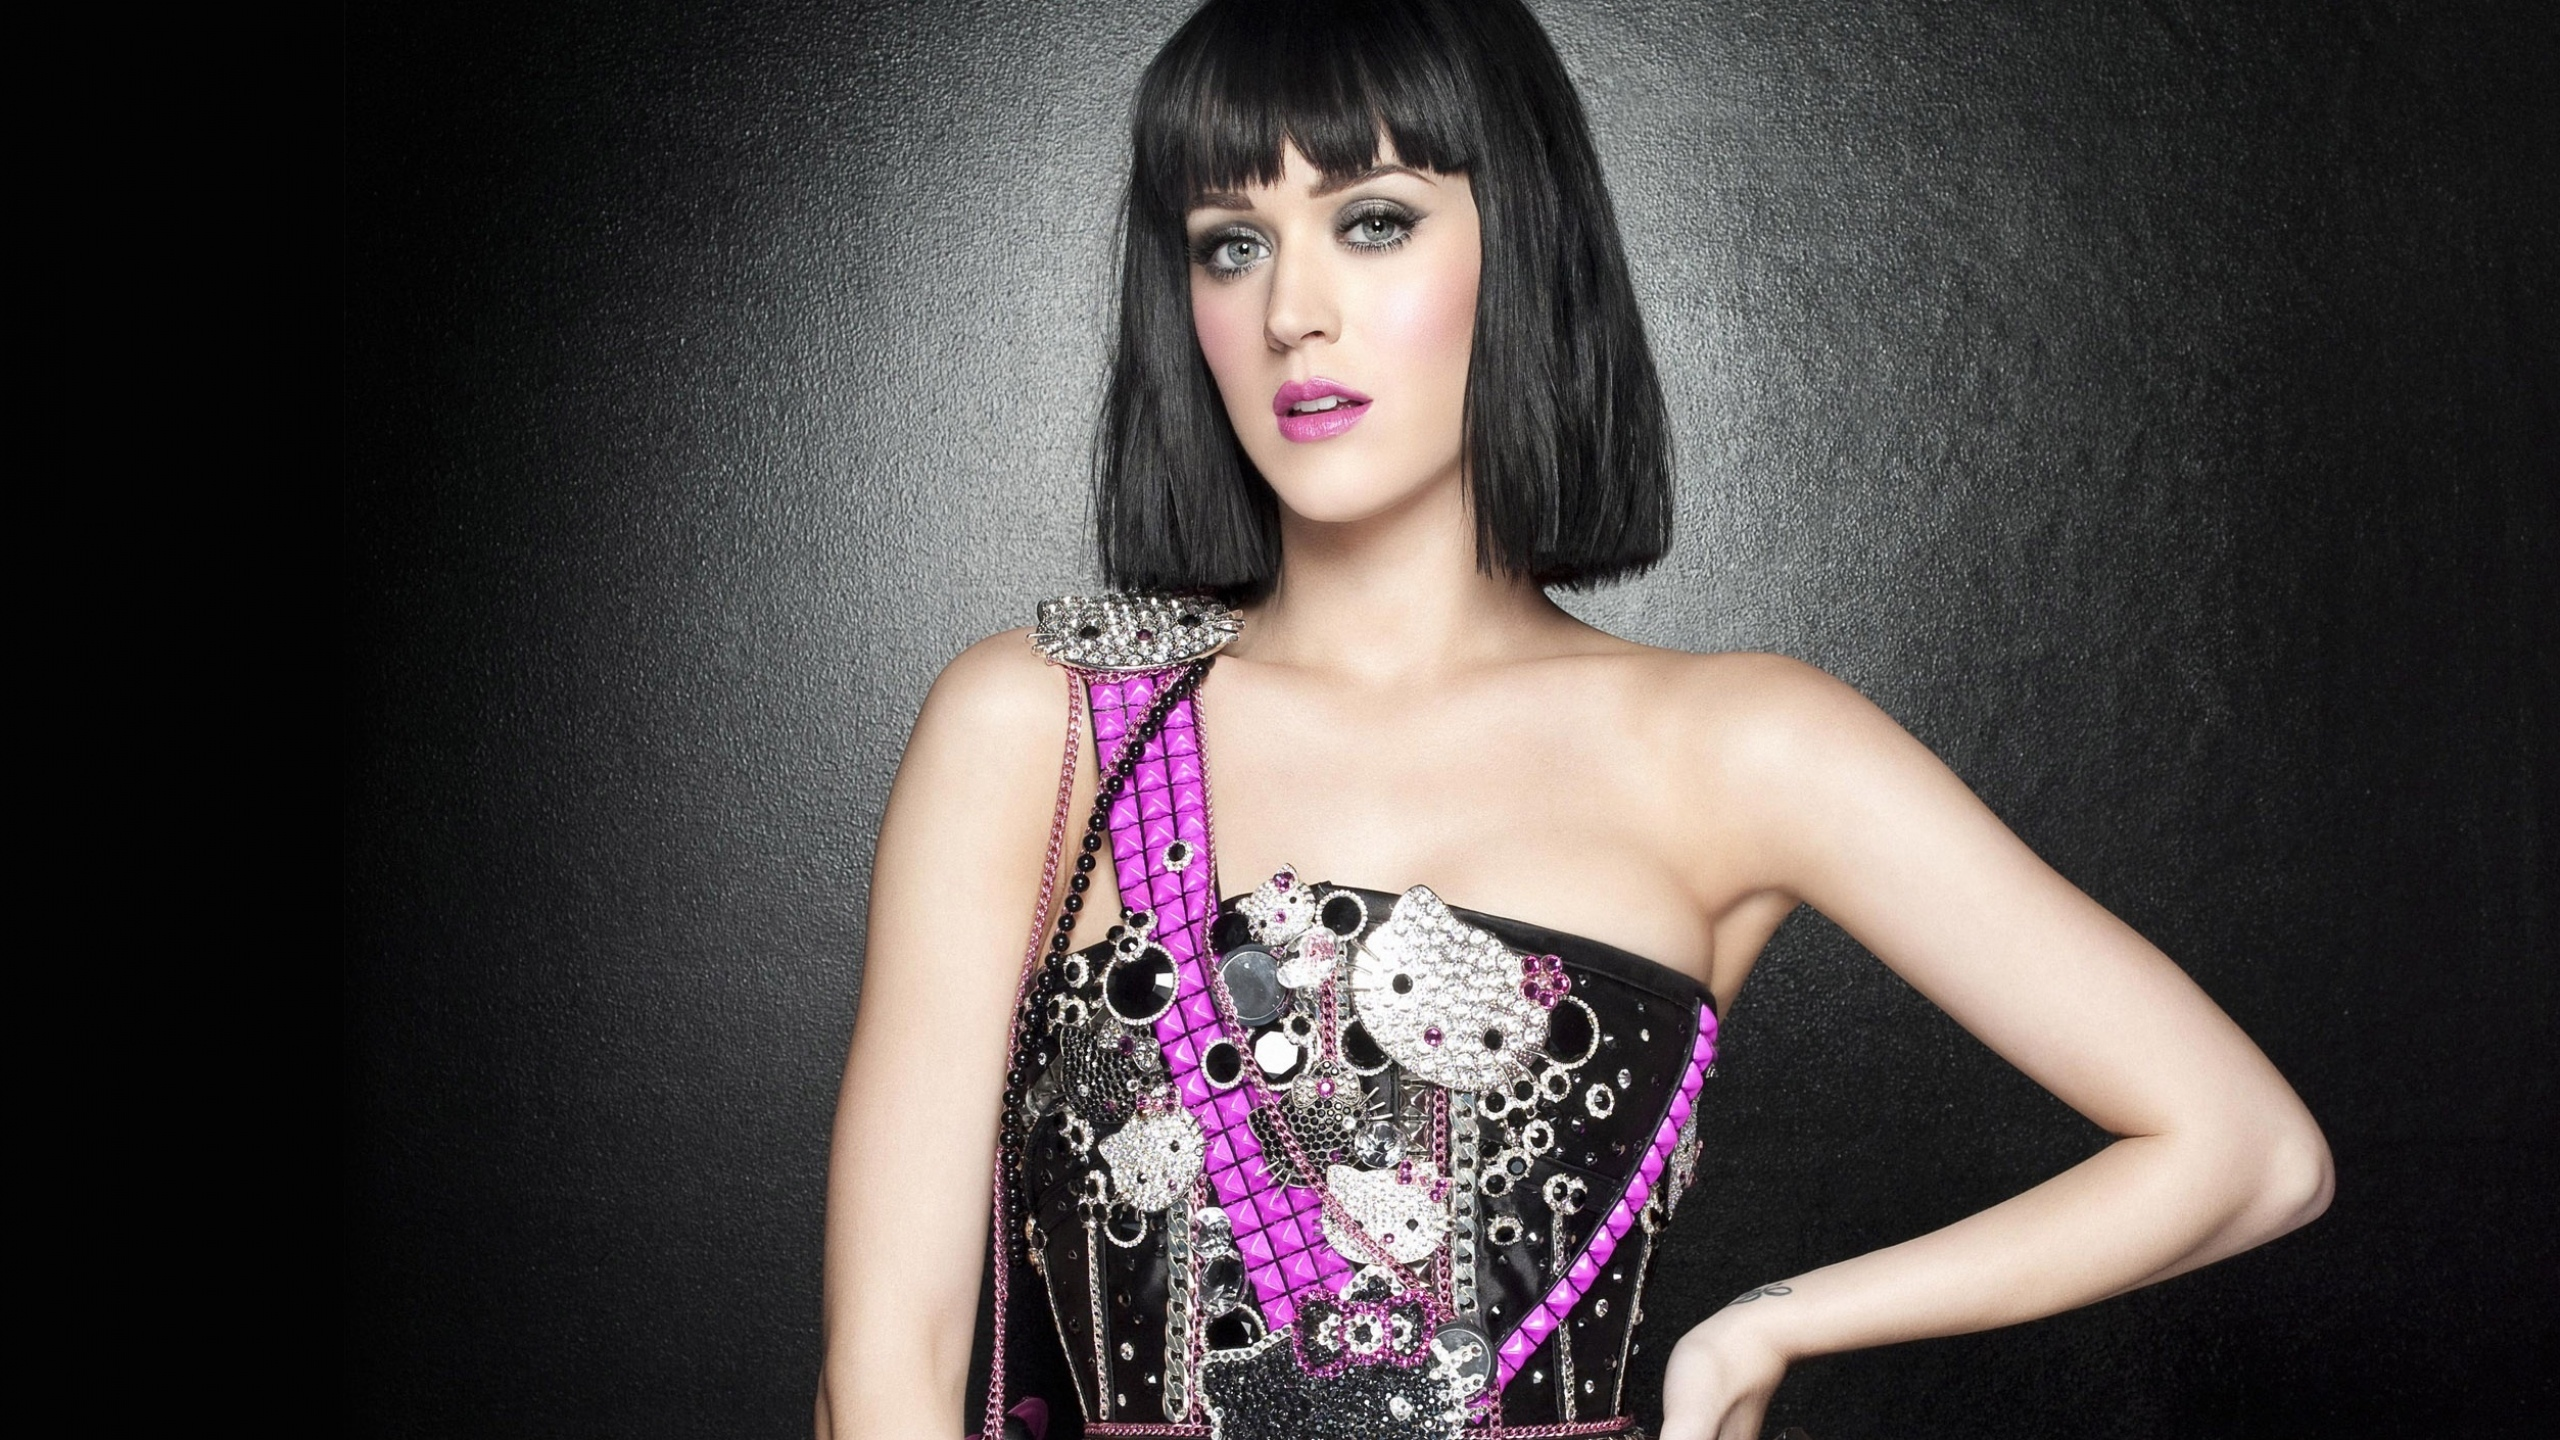 Katy Perry HD Wallpaper